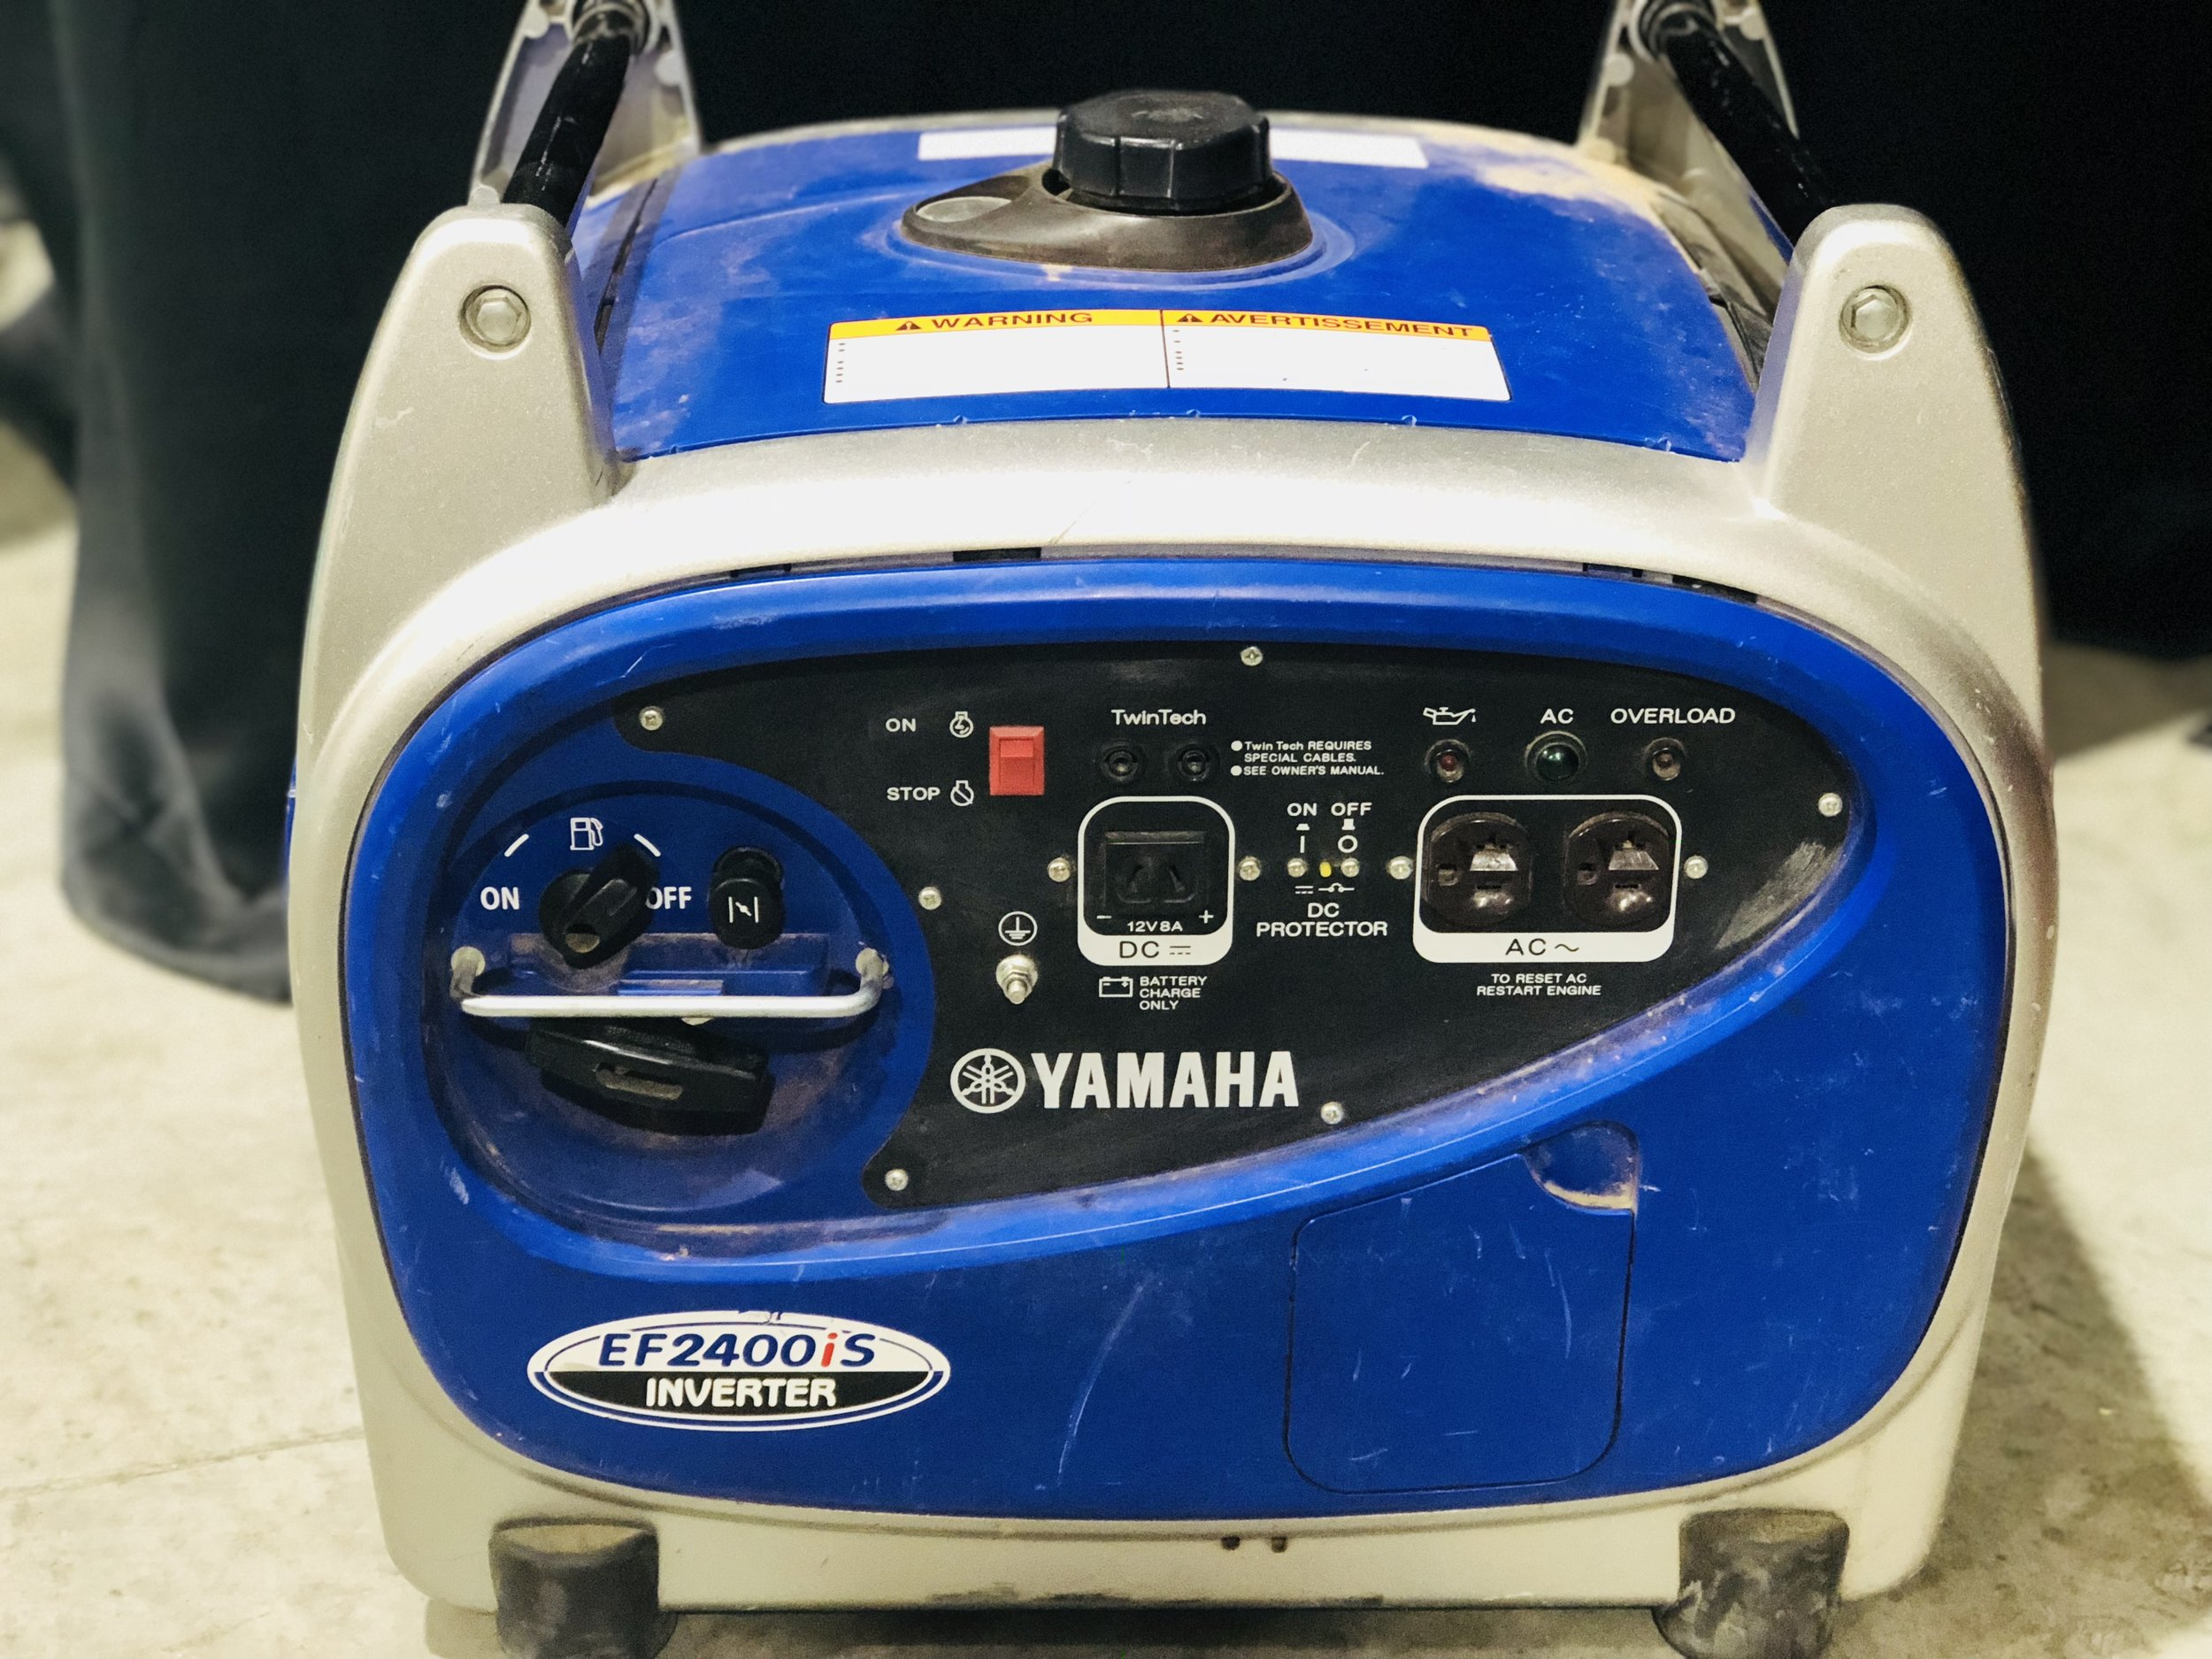 Generator Rental - Rent a 2400 watt Yamaha generator with an inverter$15.00 per day**Call to reserve**